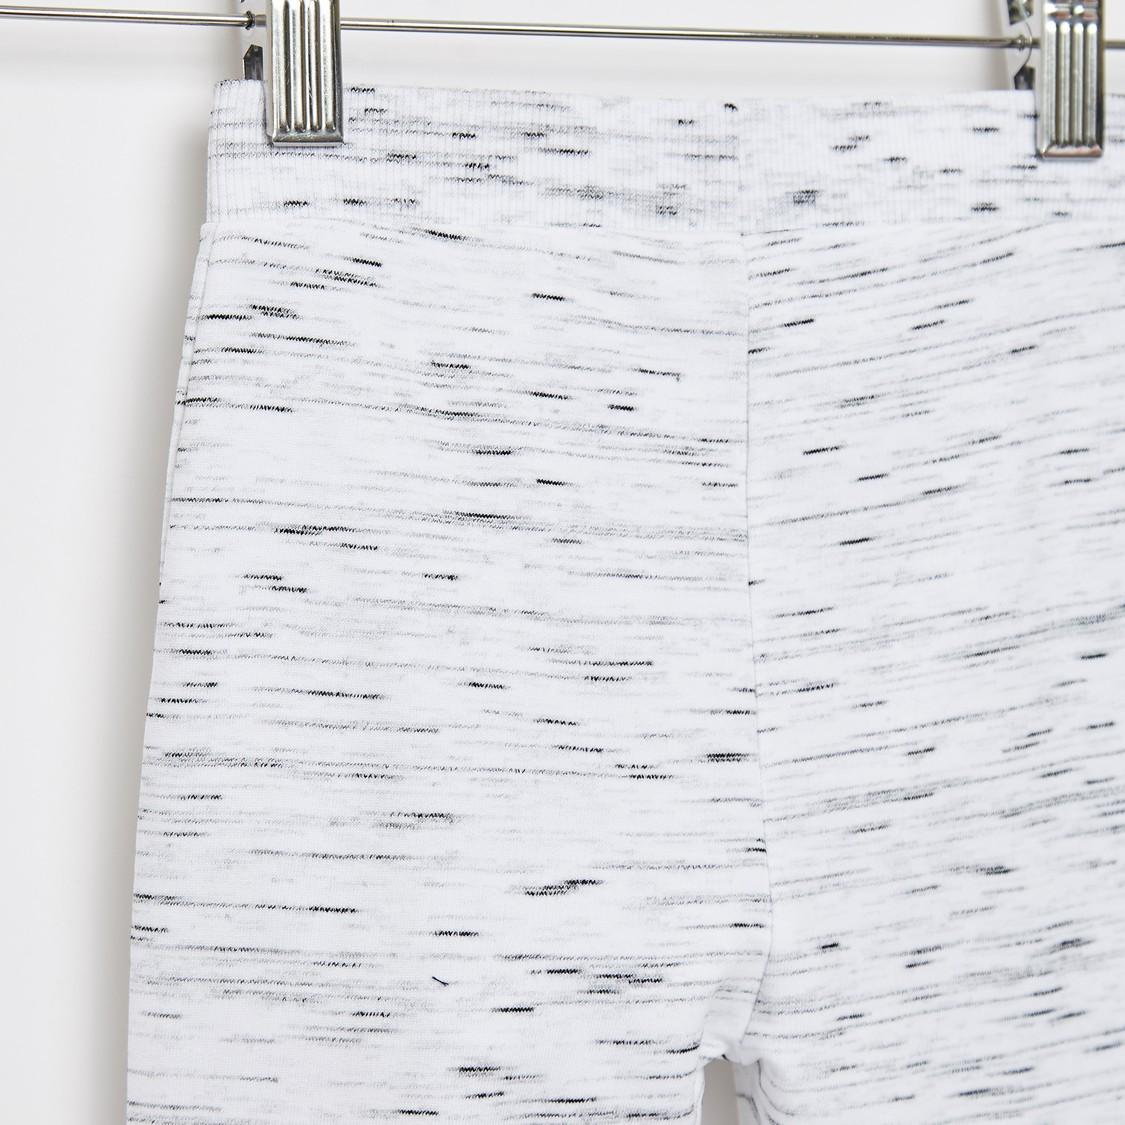 Full Length Textured Jog Pants with Pockets and Drawstring Closure